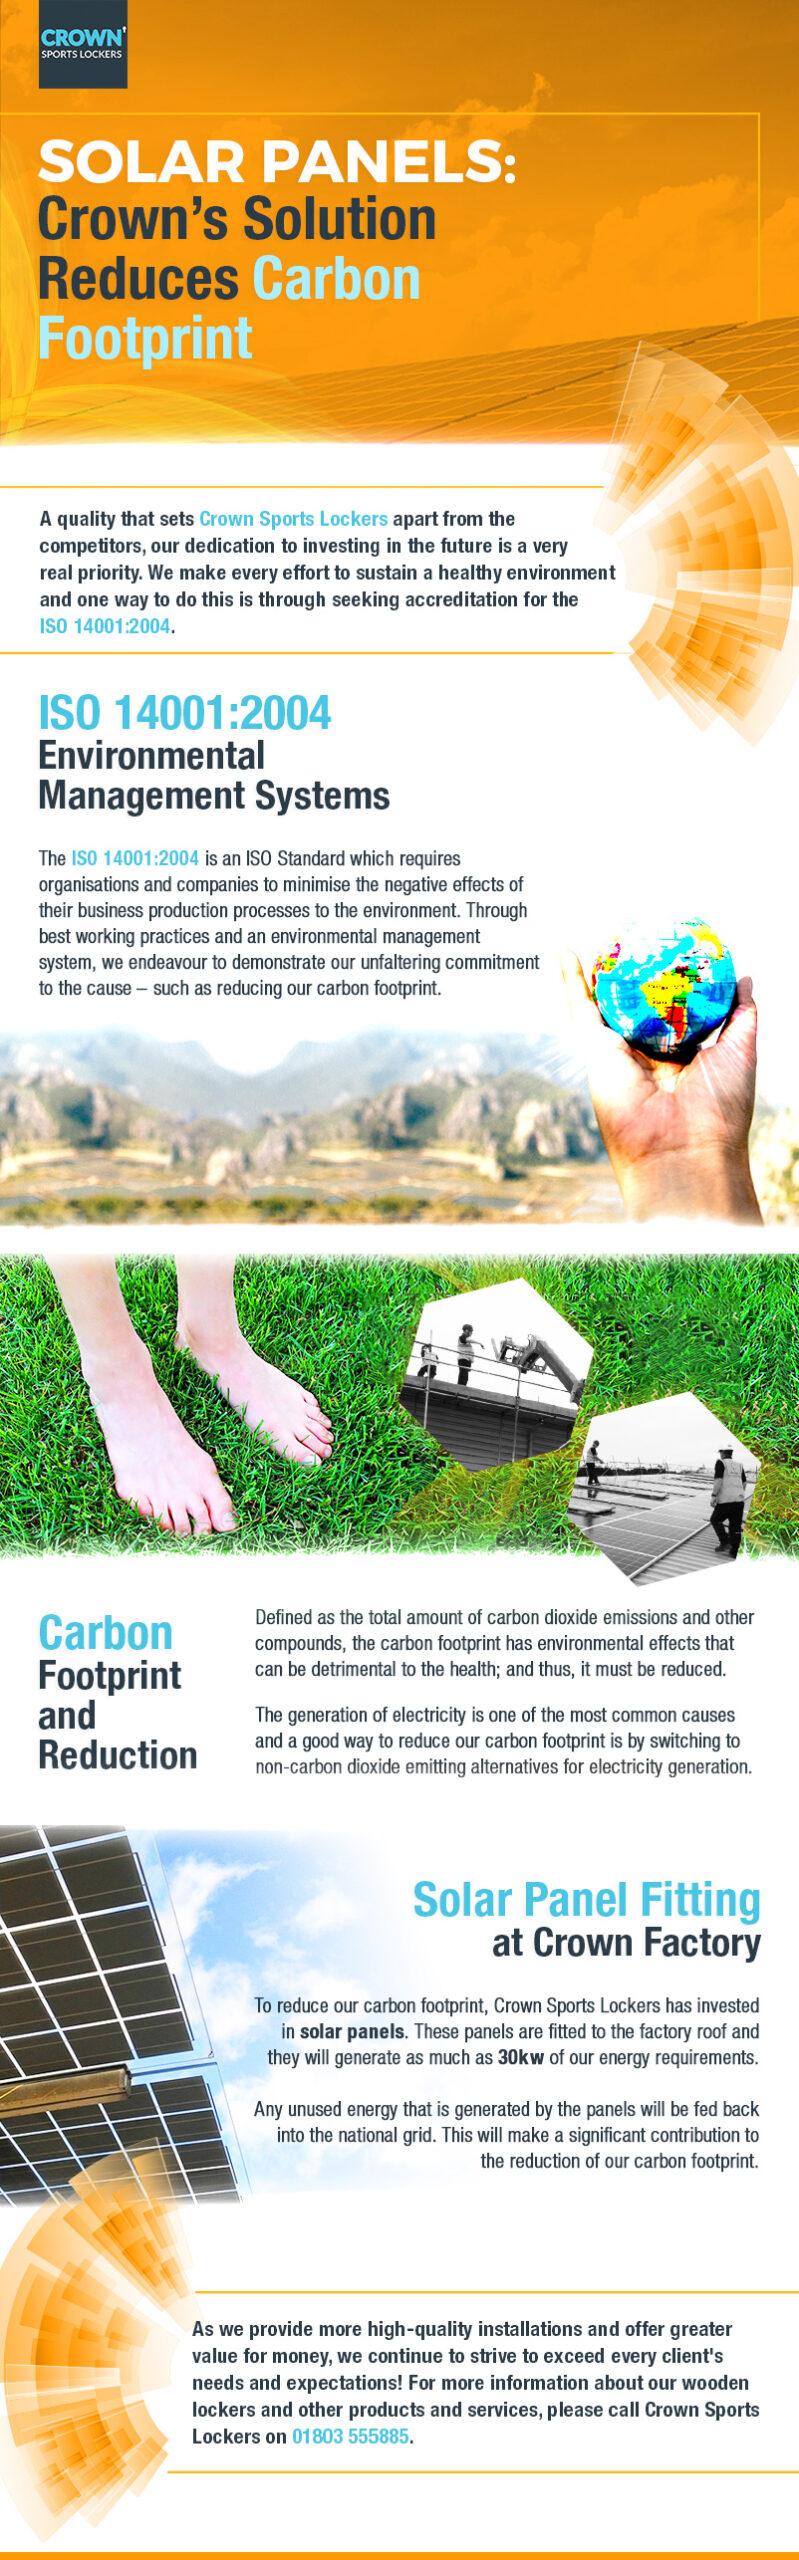 Crown-Sports-Lockers-Solar-Panels-Crown-Reduces-Carbon-Footprint-Infogra...